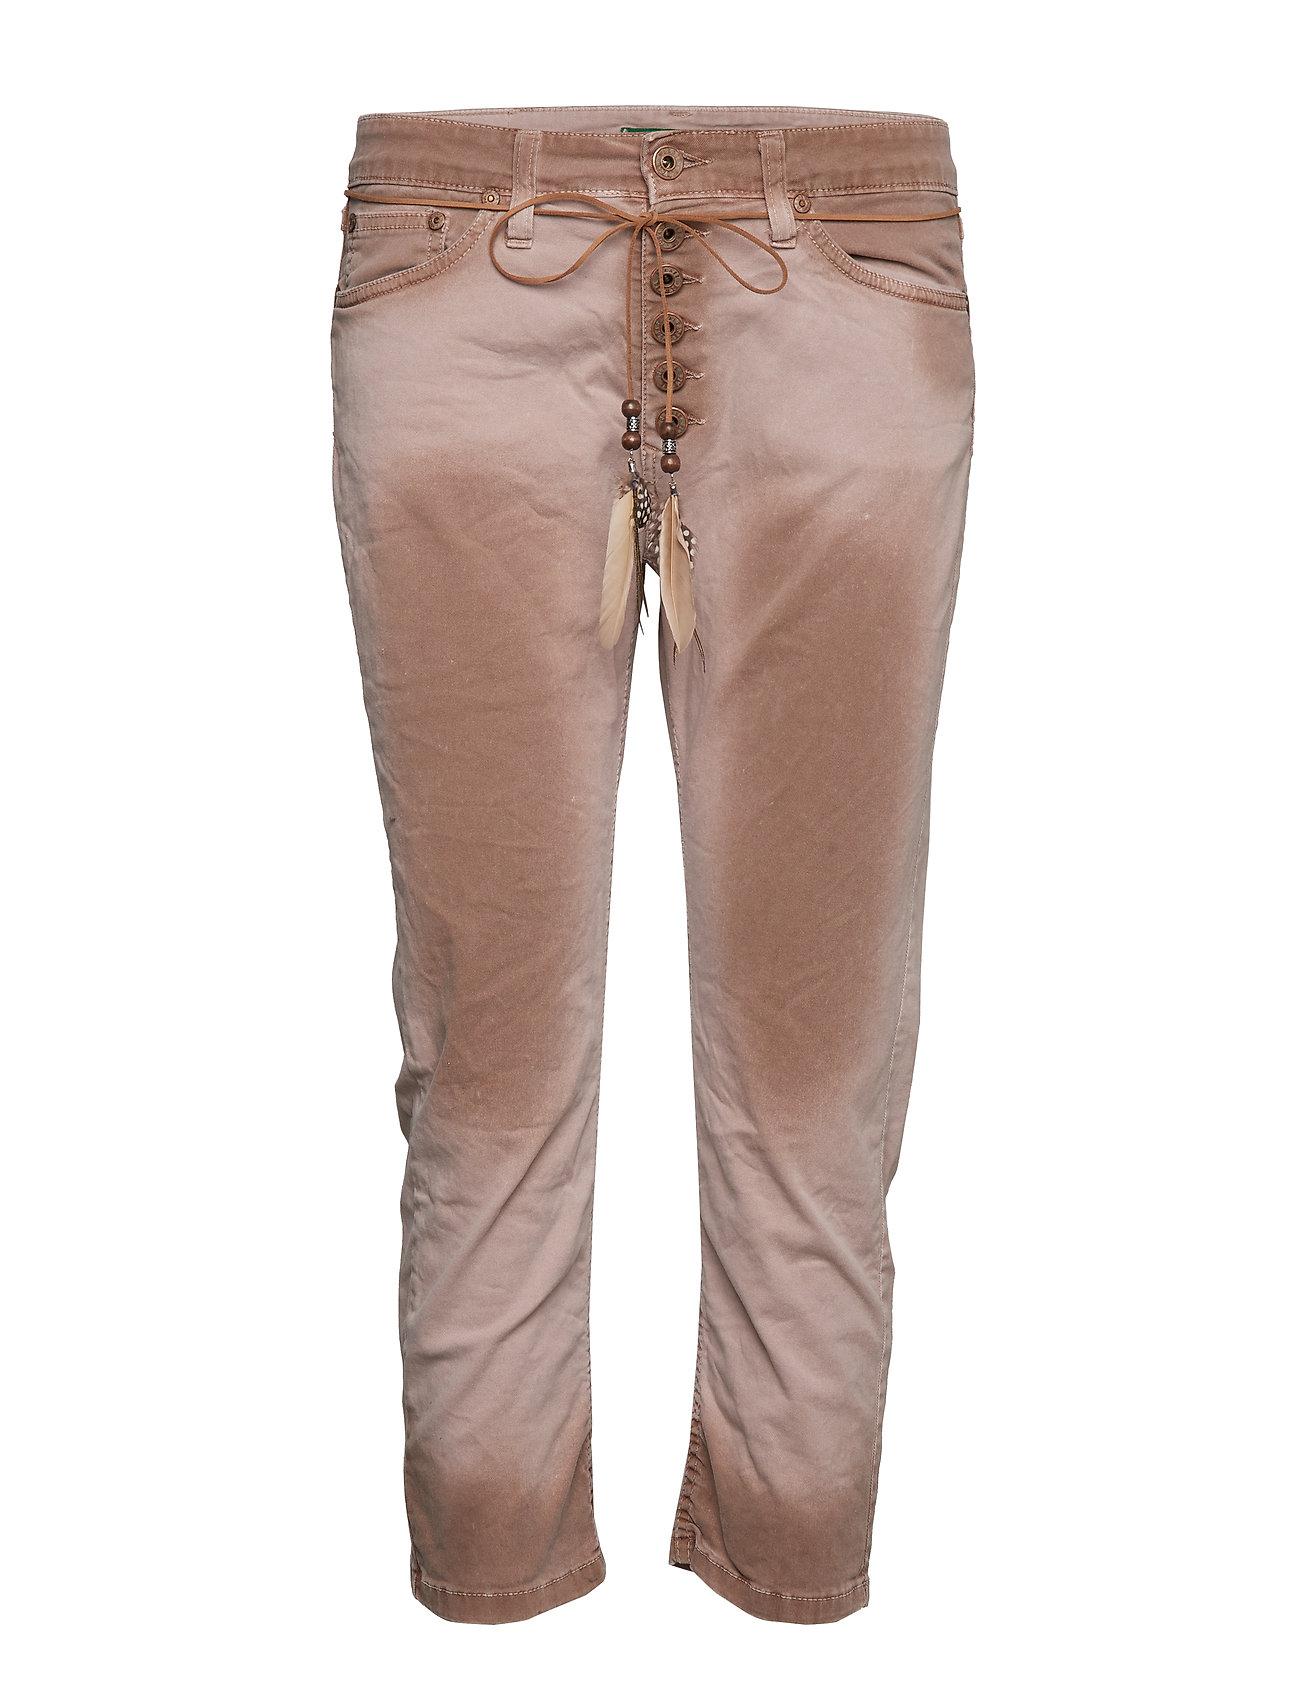 Please Jeans 6B Capri Rame rosa Jeans